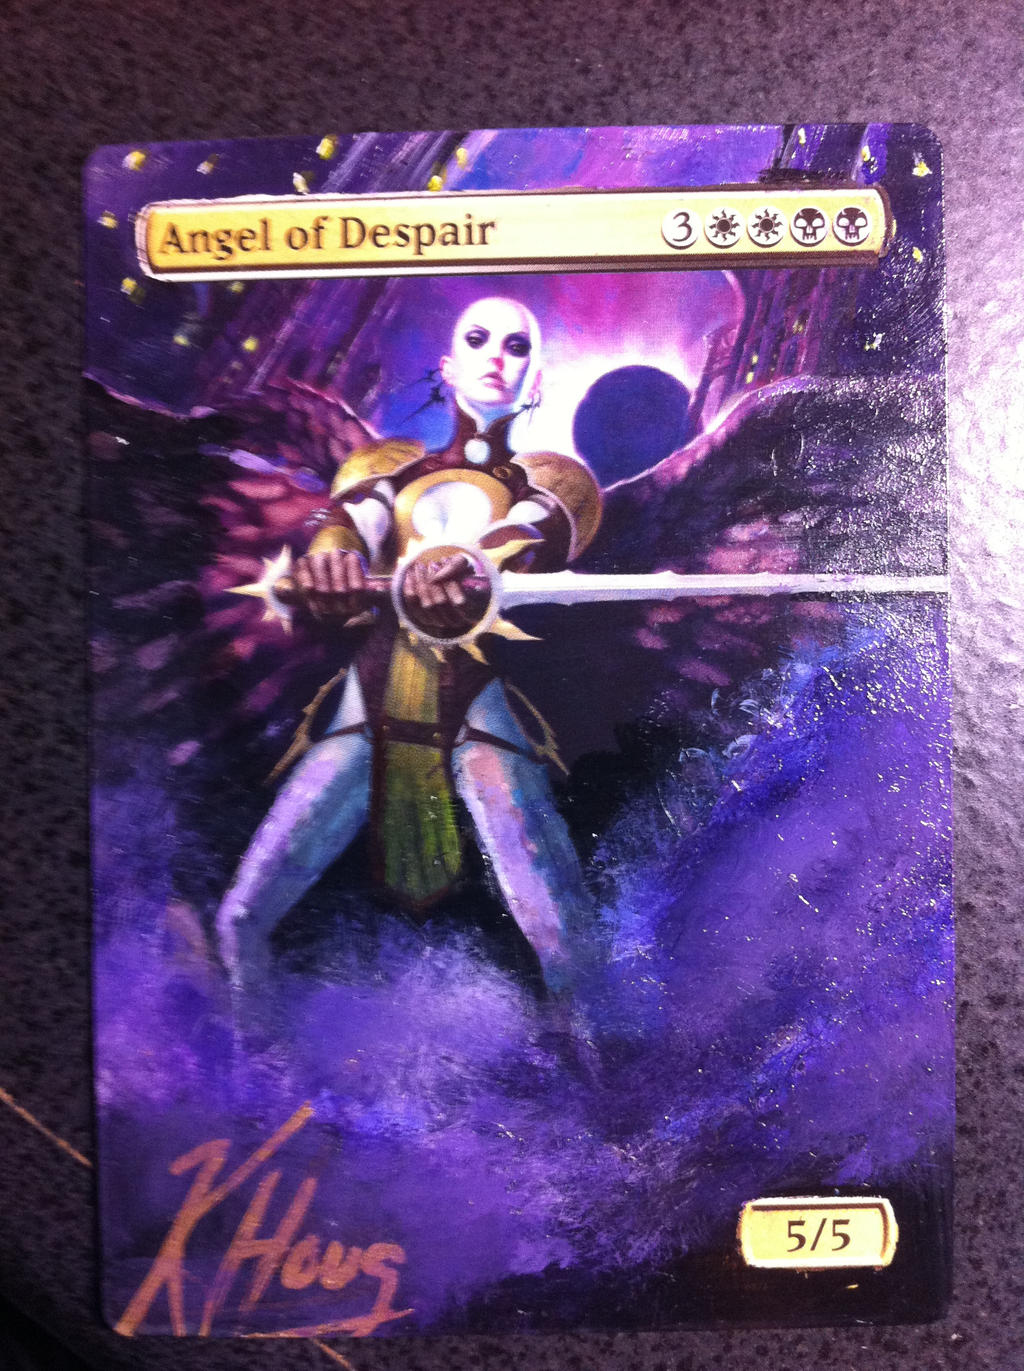 MTG Alter: Angel of Despair by kermint on DeviantArt